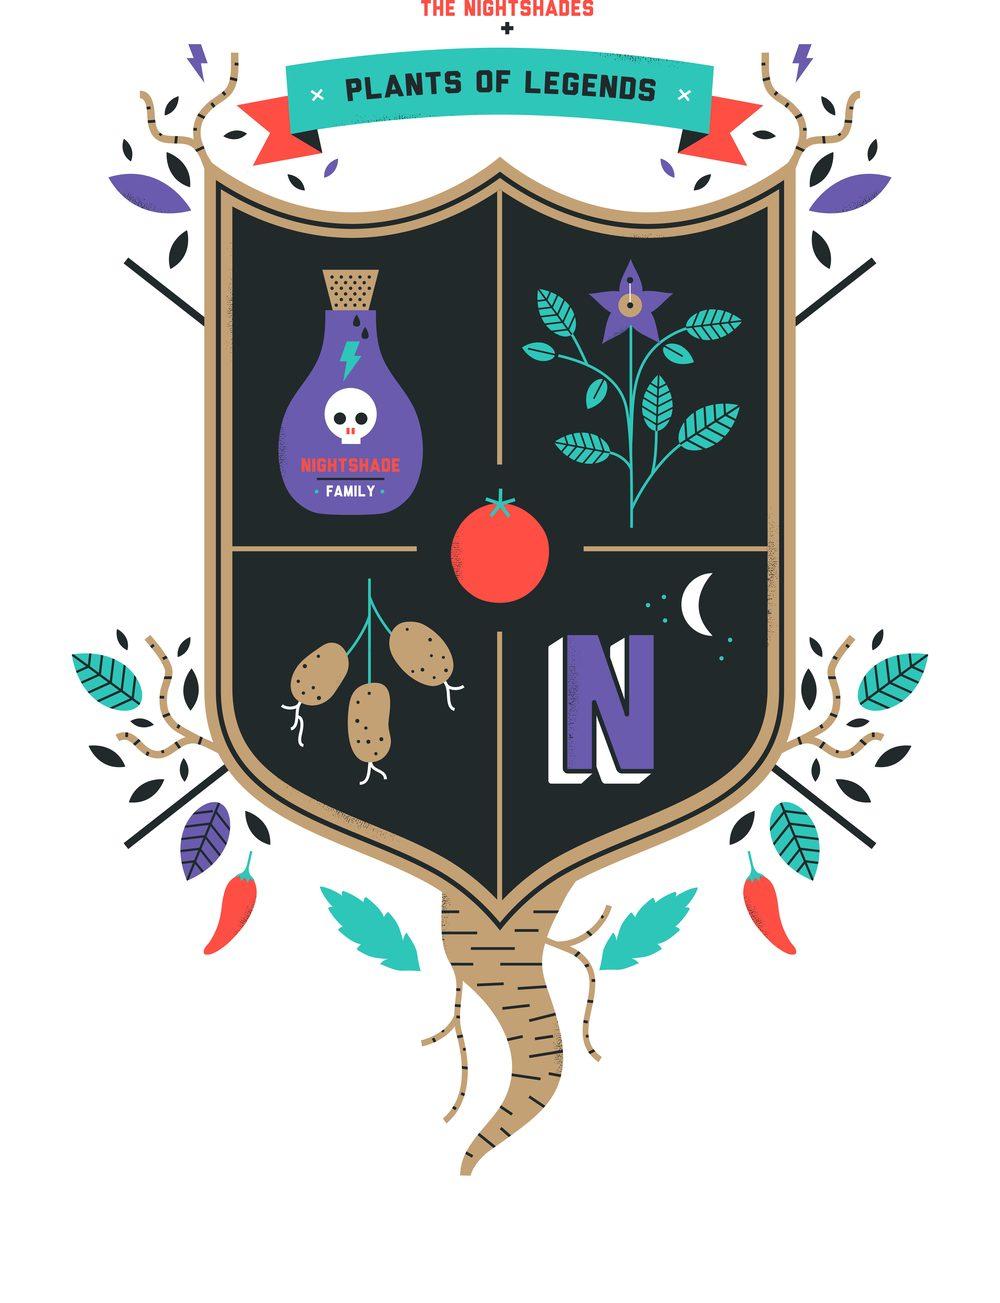 hannah+holly-illustration-cambridgeuniversitybotanicgarden-plantfamilies-crests-badges-nightshades.jpg